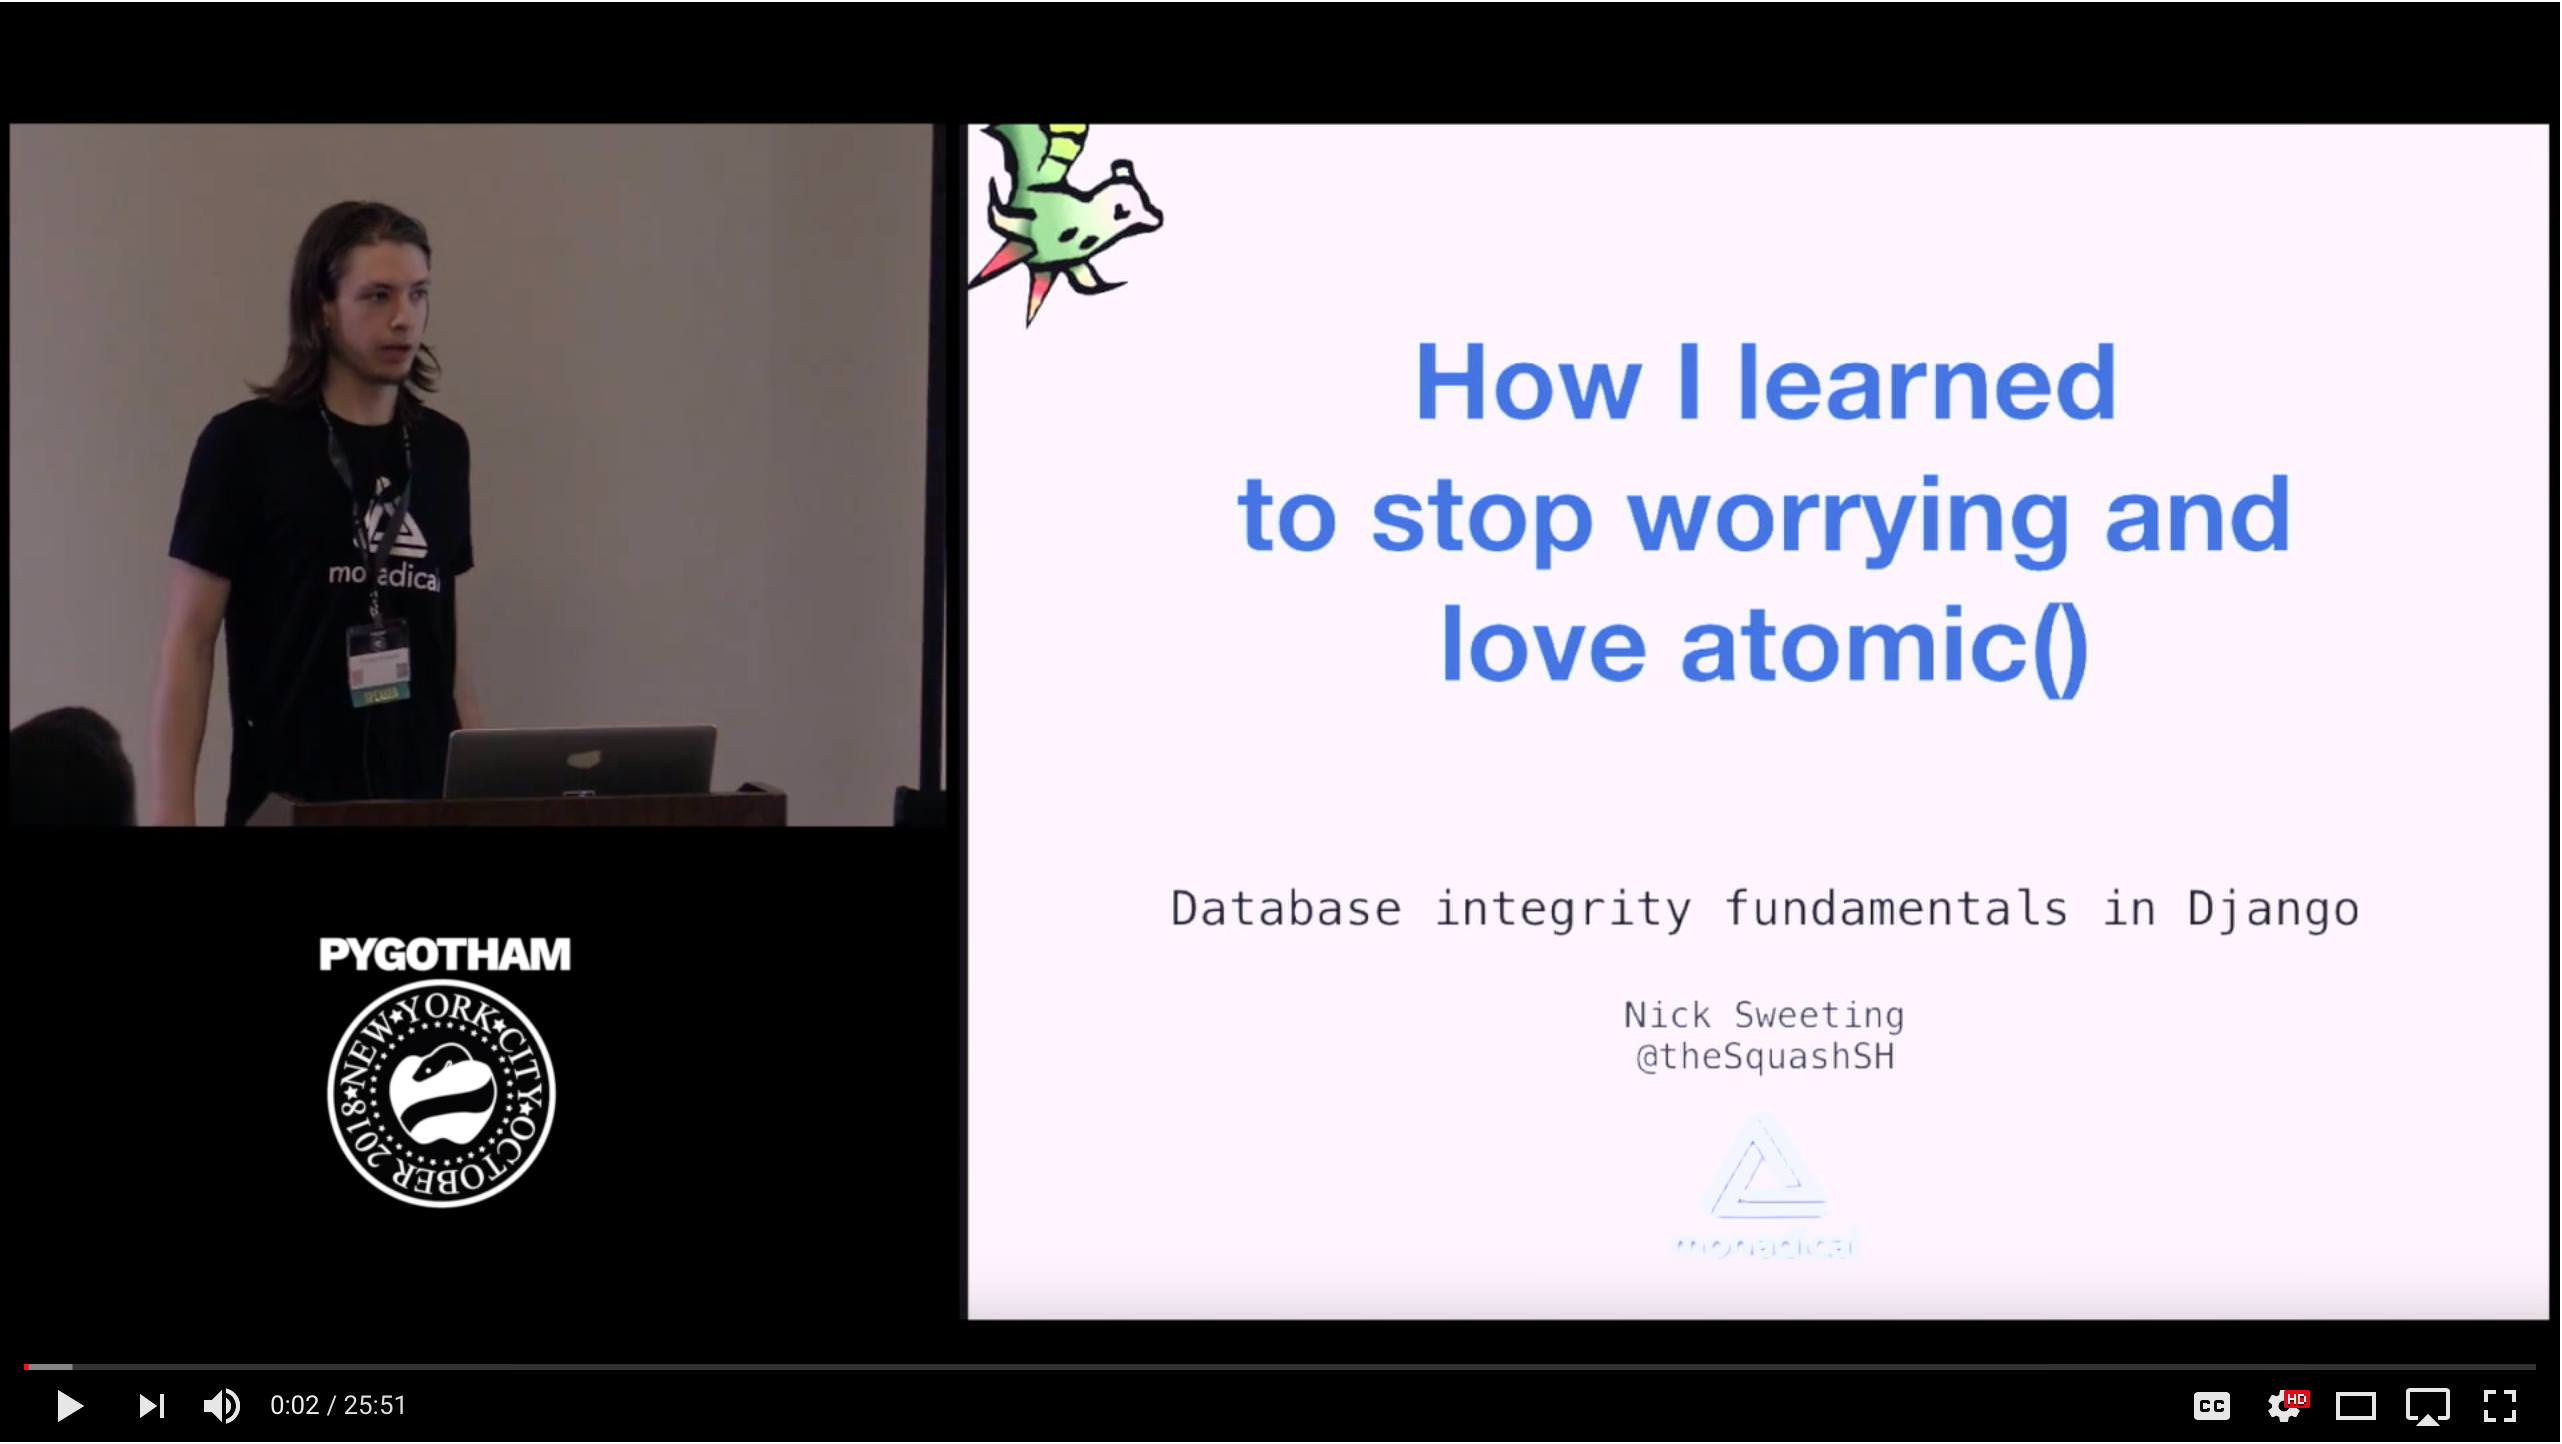 First slide of talk